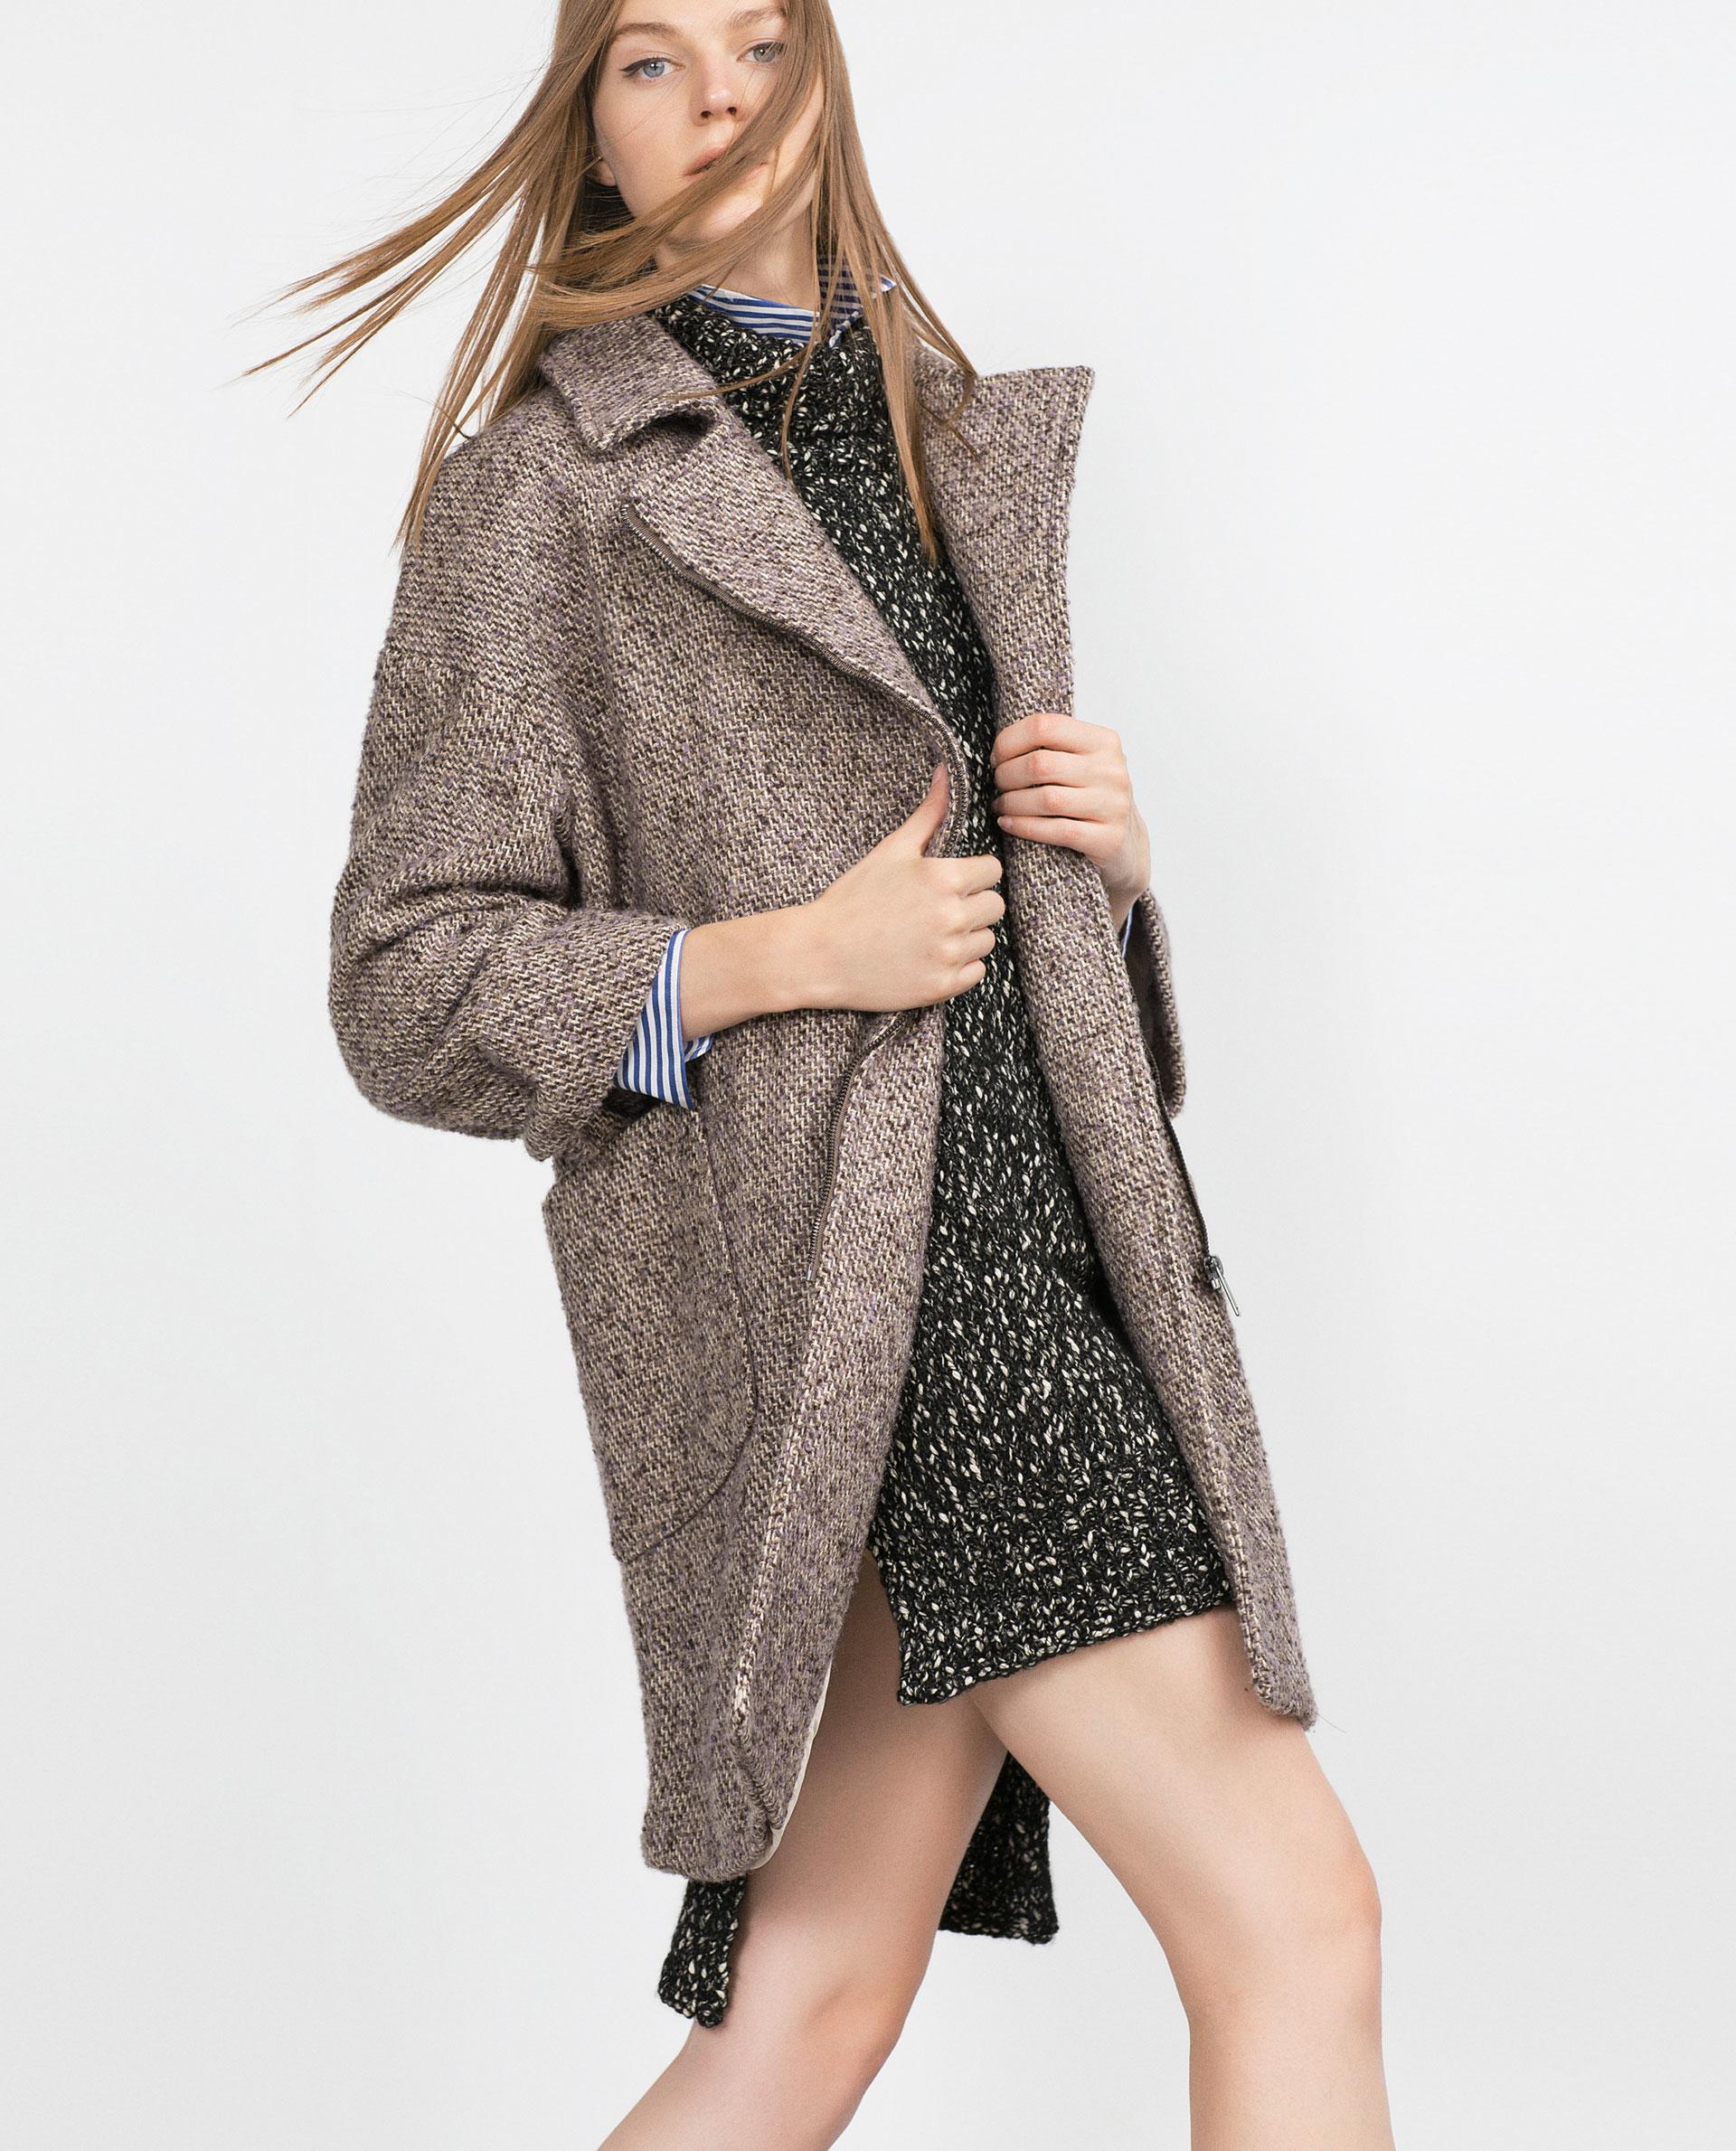 Zara Wool Coat With Zips